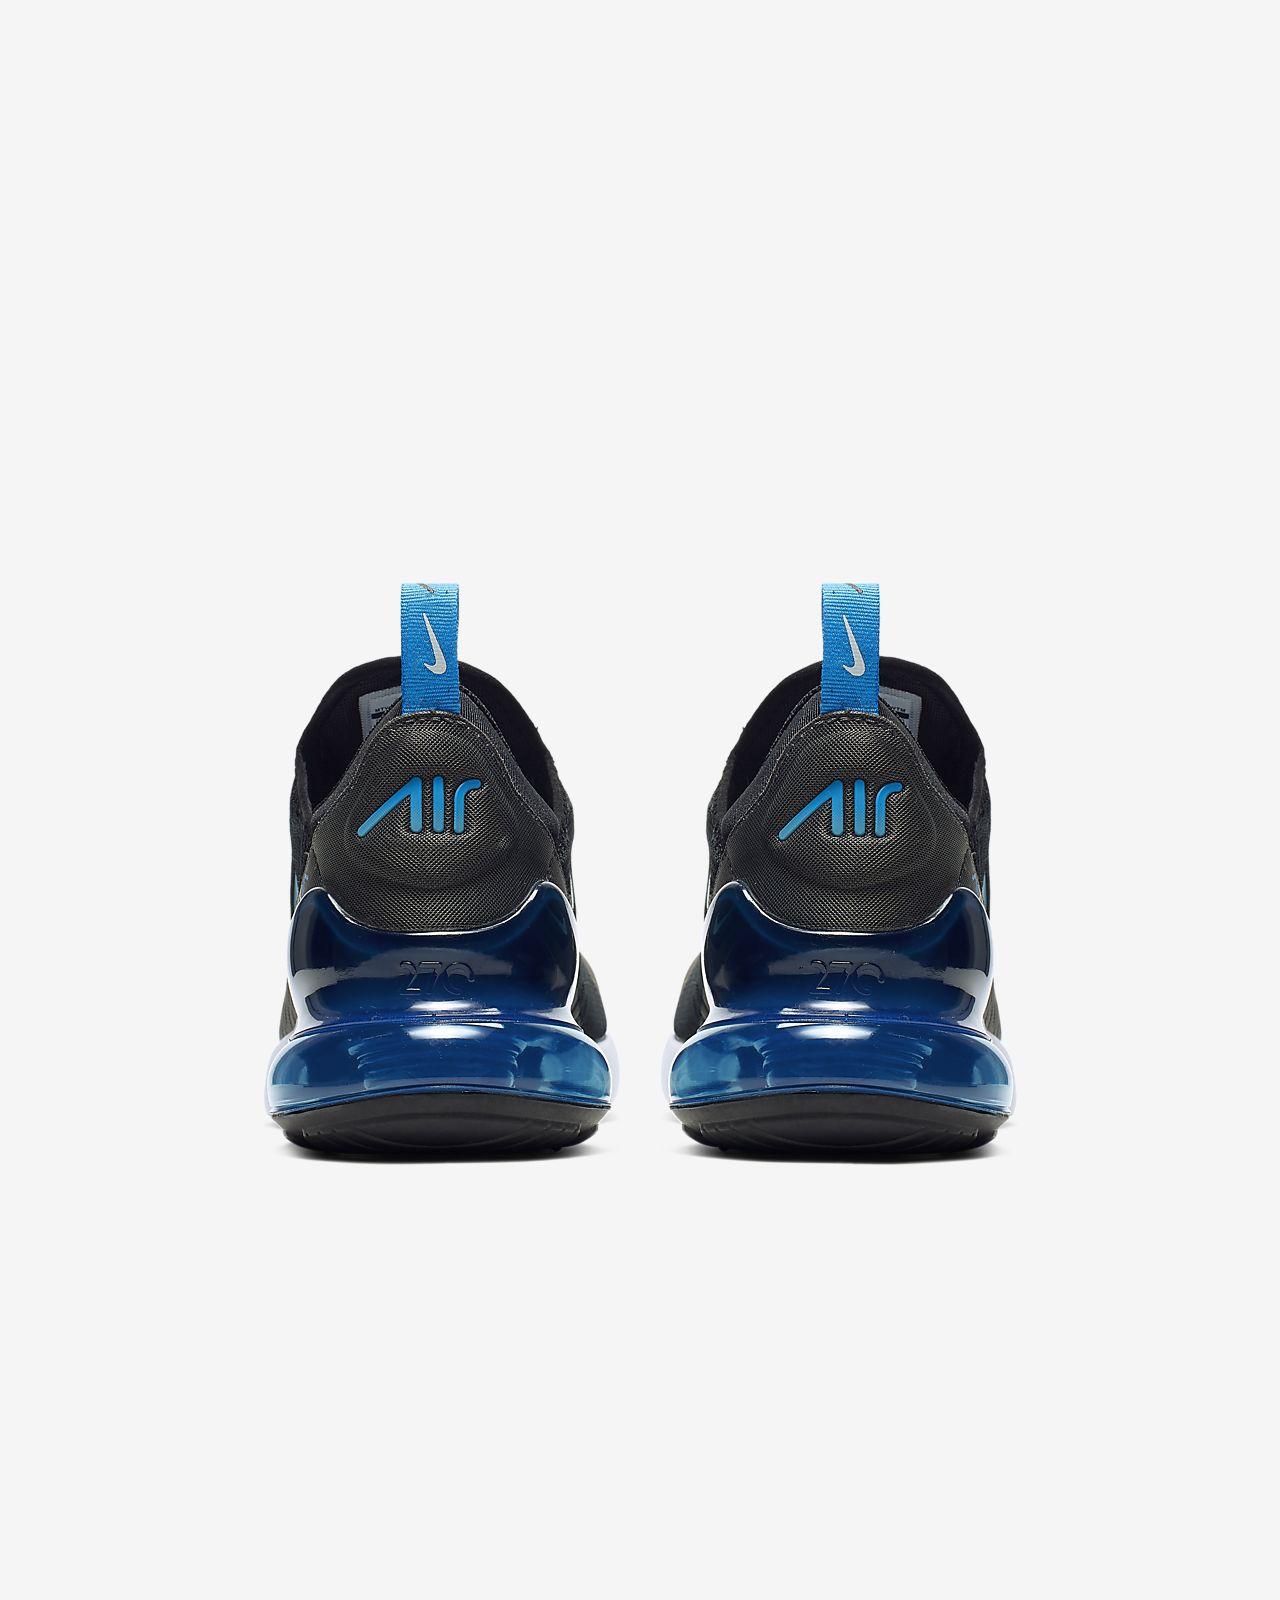 f658fc078a1d6 Chaussure Nike Air Max 270 pour Homme. Nike.com FR